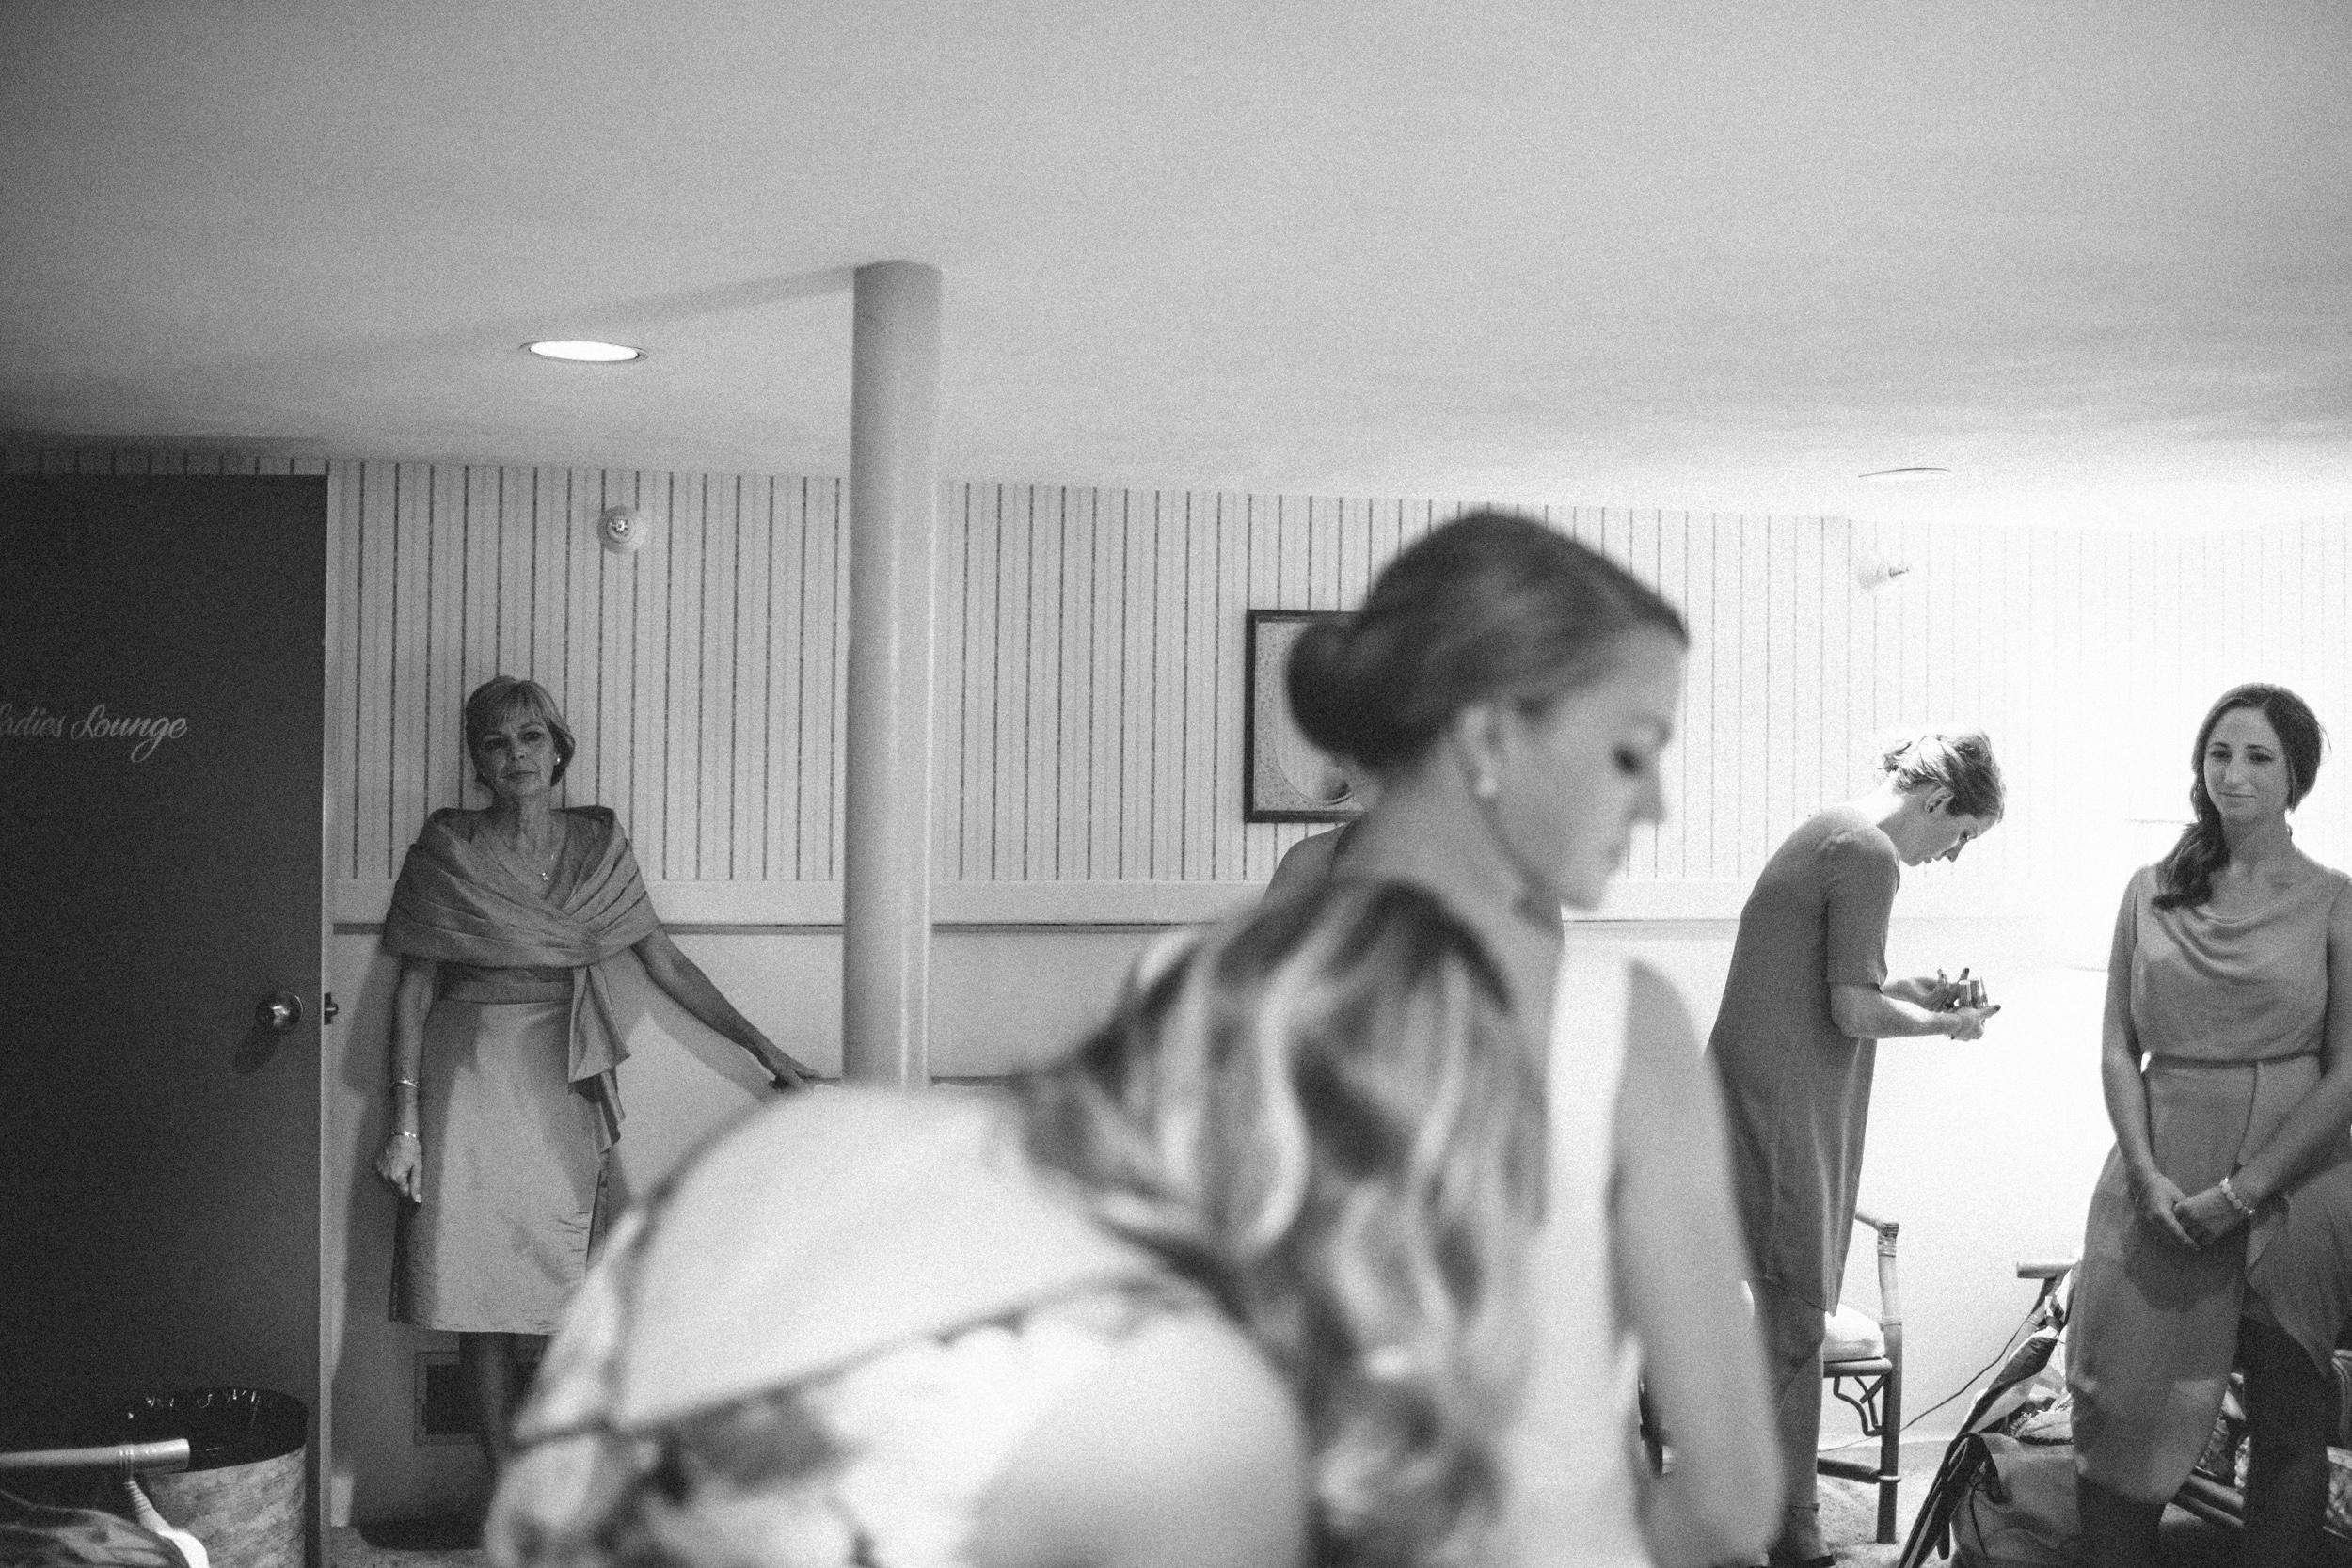 10-05-2013 maggie & adam wedding photography by brian milo-104.jpg